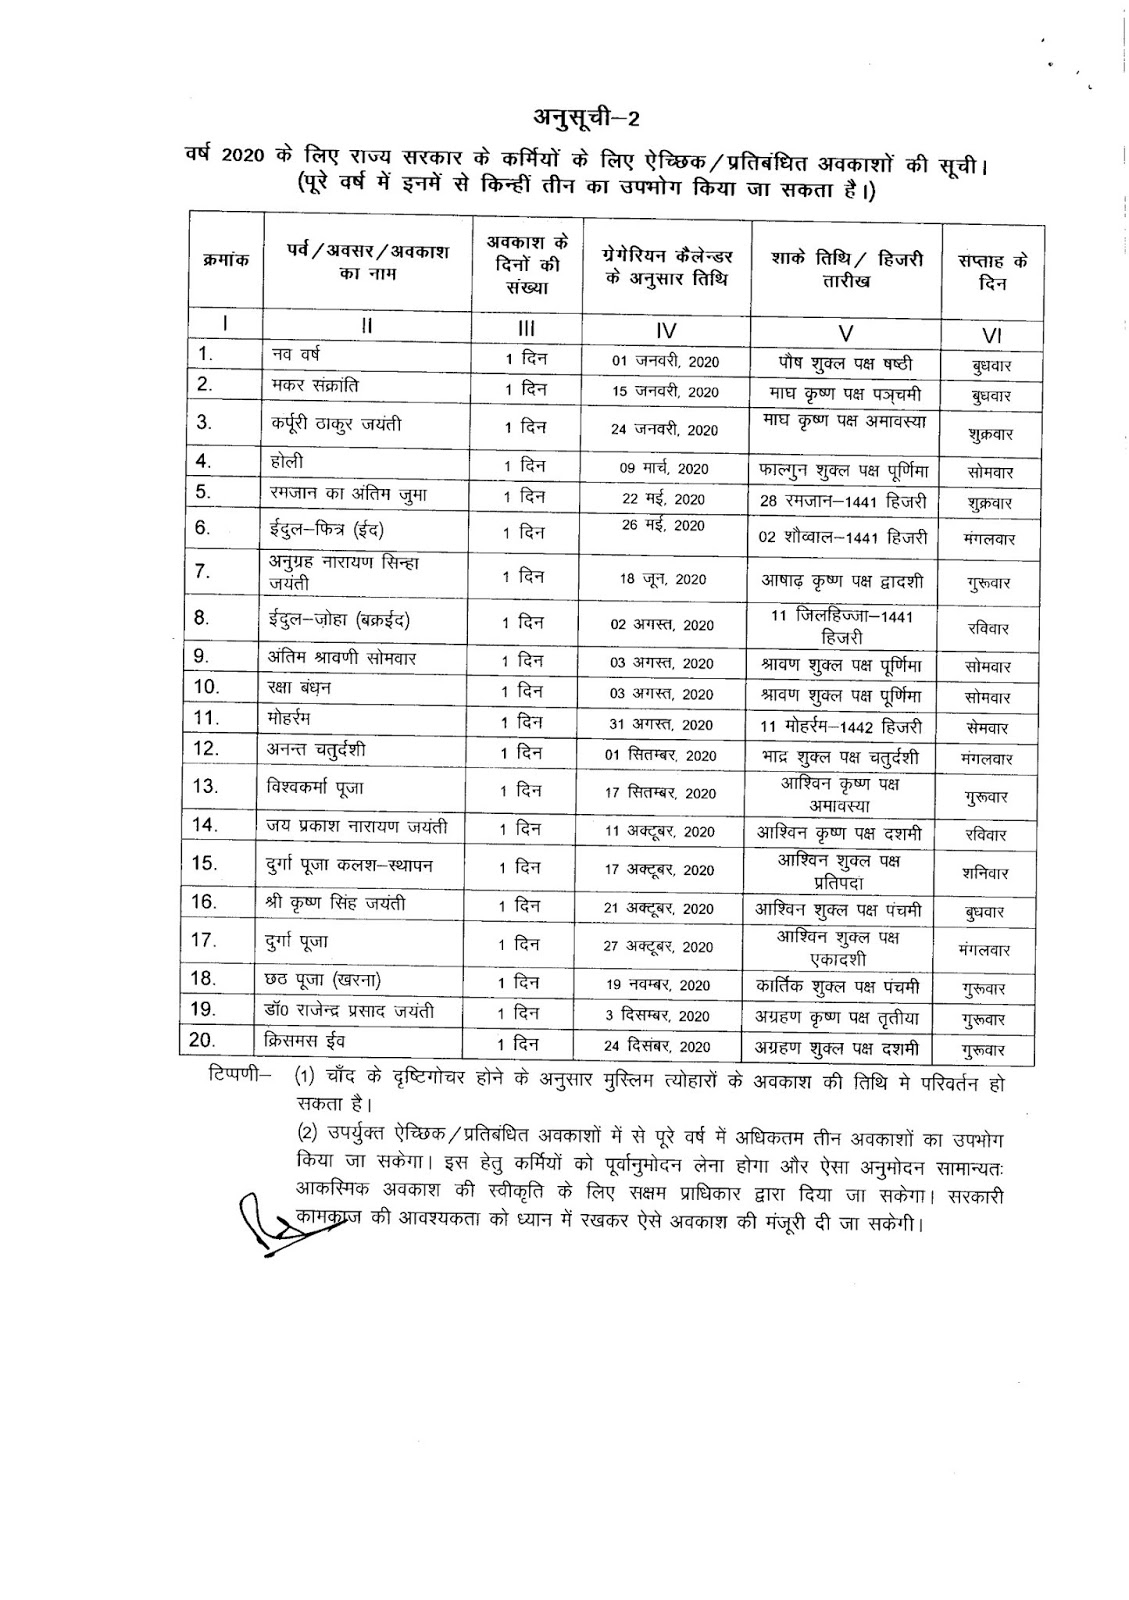 Bihar Government Calendar 2020 #educratsweb in Bihar Govt Calender